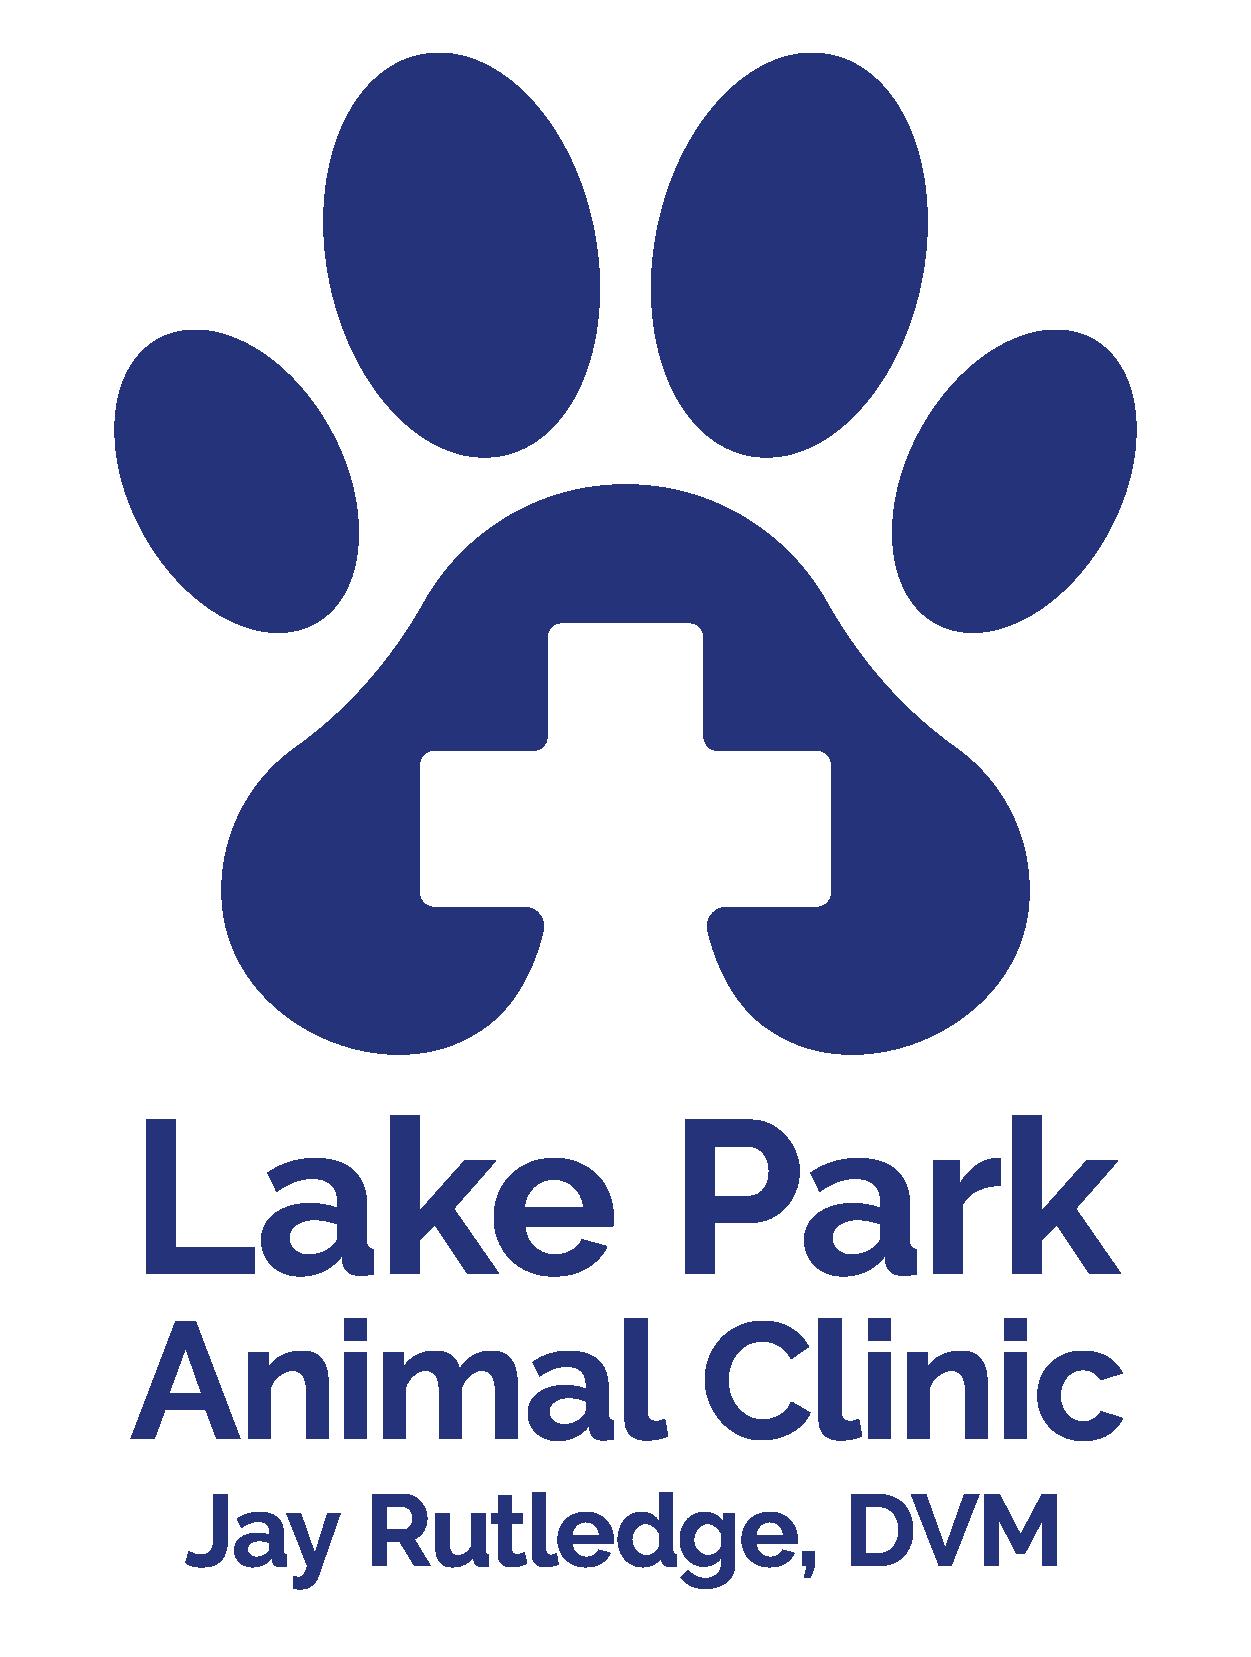 Lake Park Animal Clinic